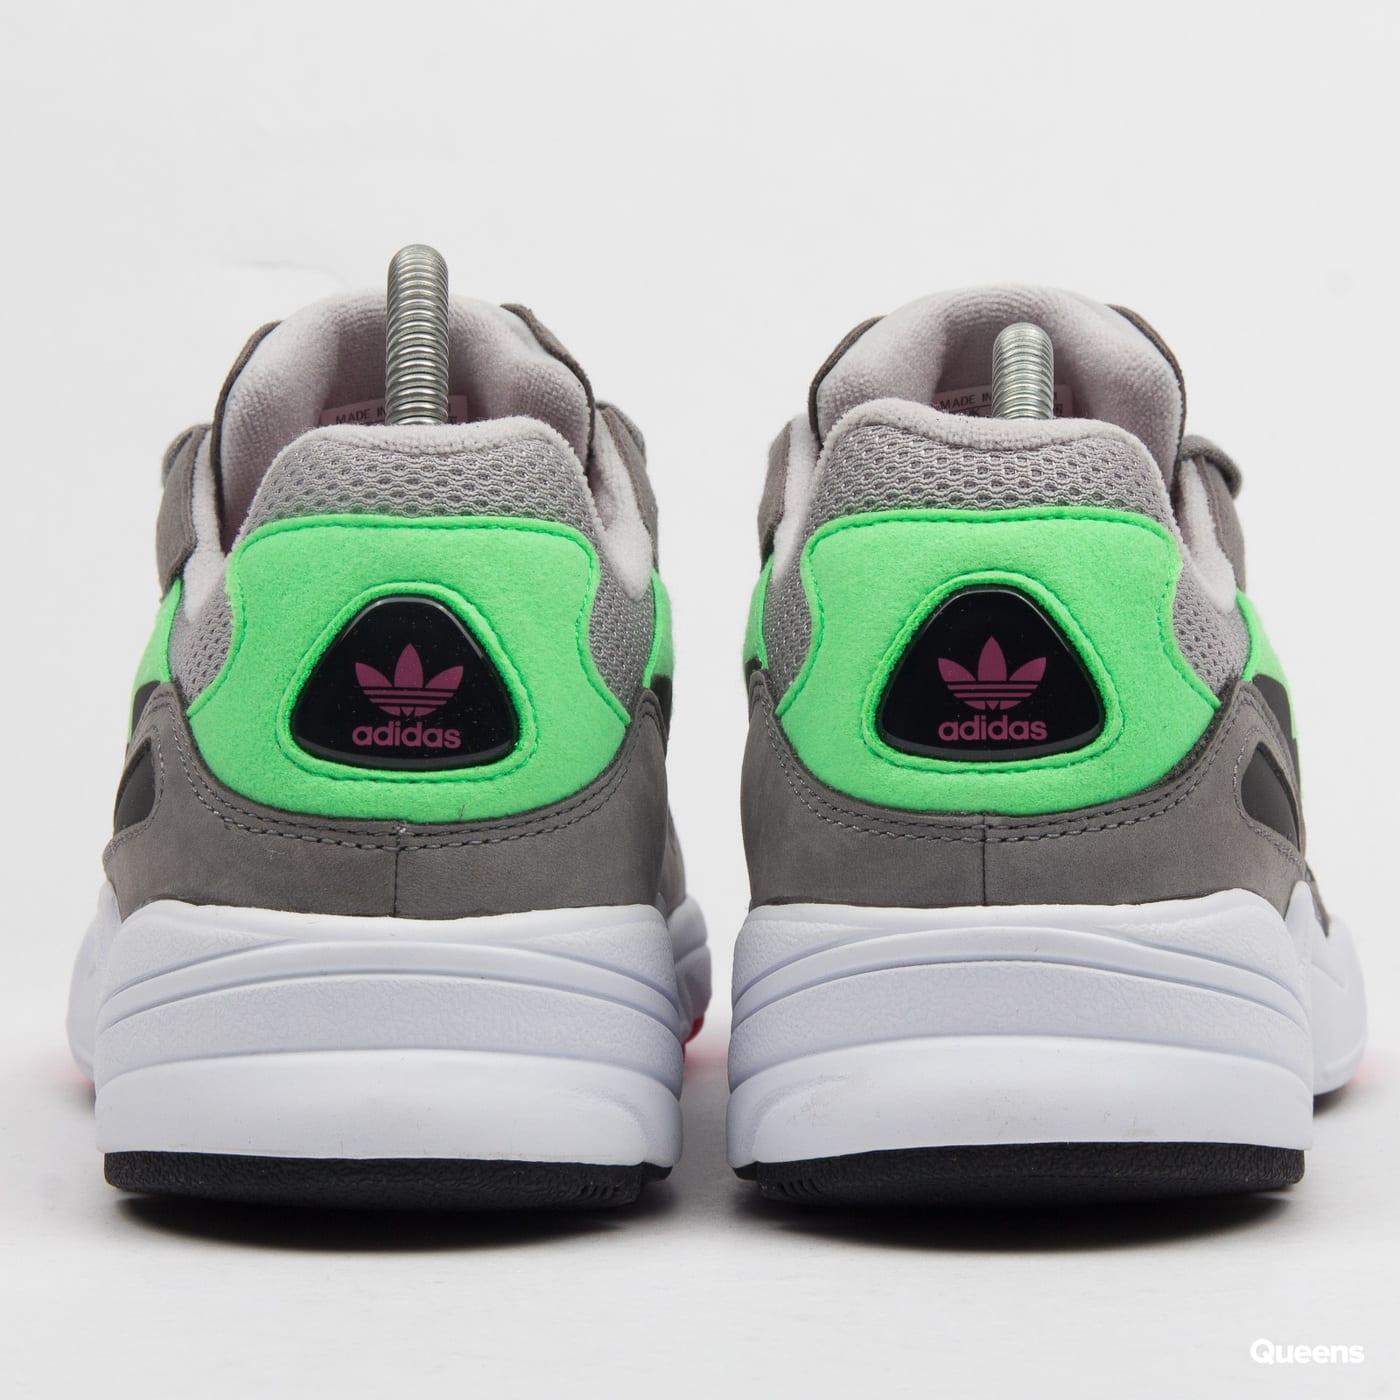 adidas Originals Yung-96 gretwo / grethr / shopink